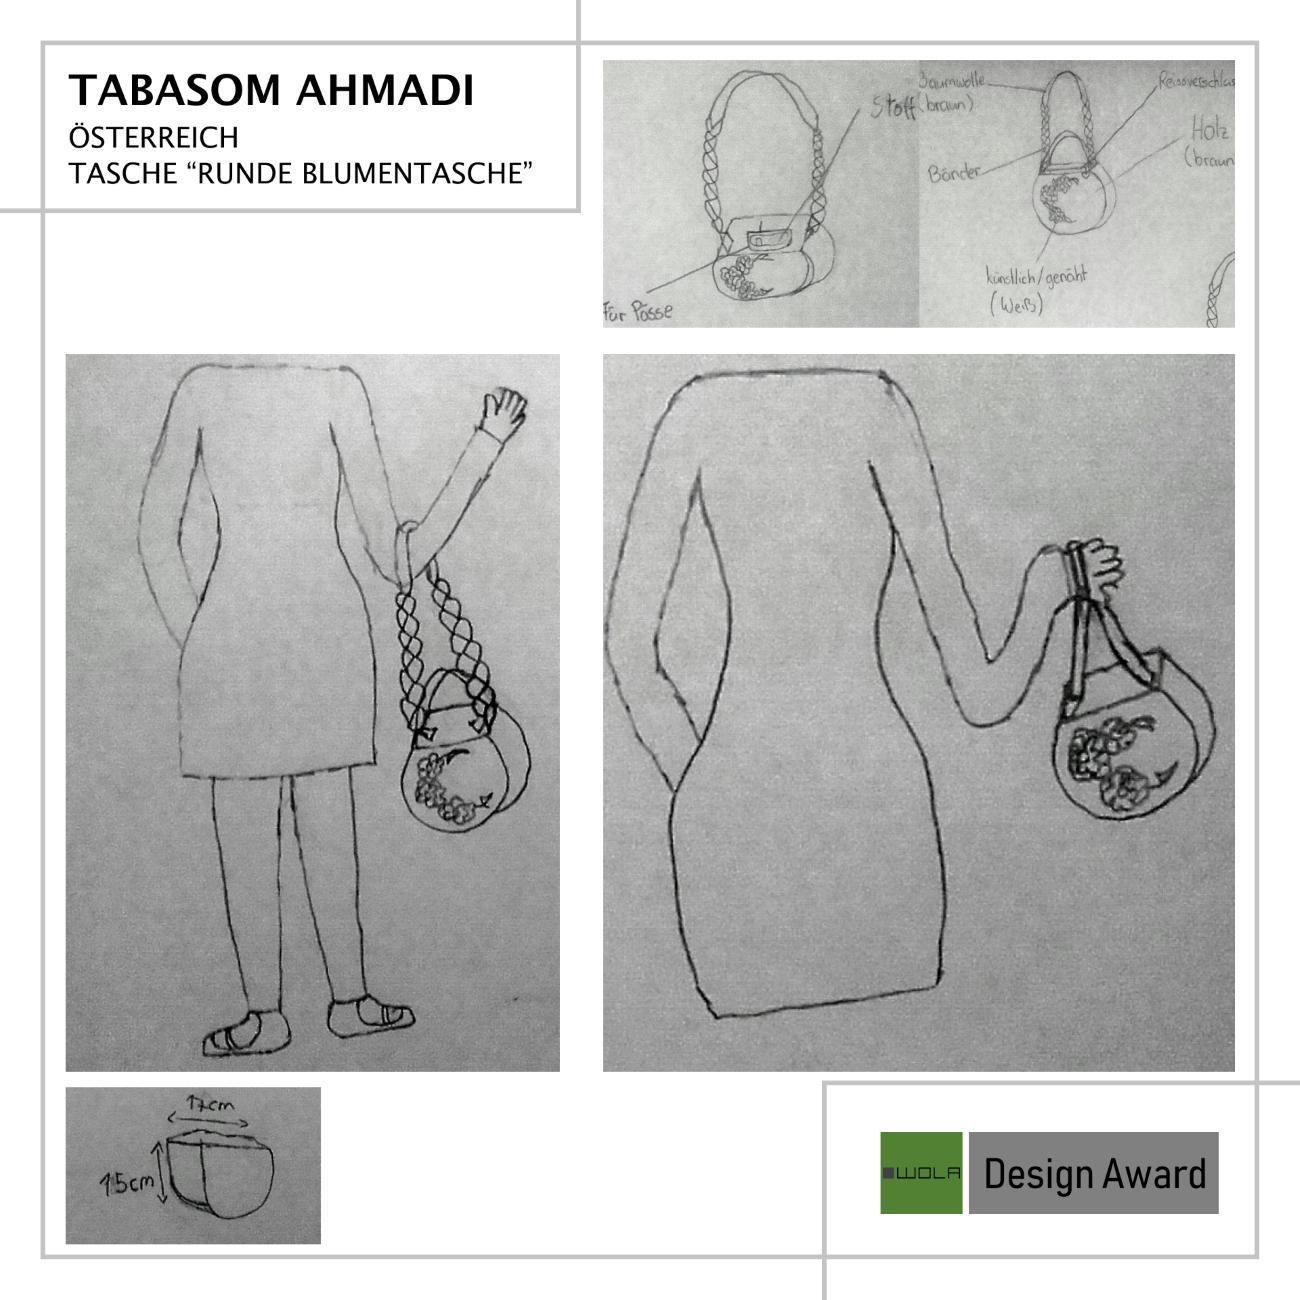 Beitrag WOLA Design Award -Tabasom Ahmadi 5